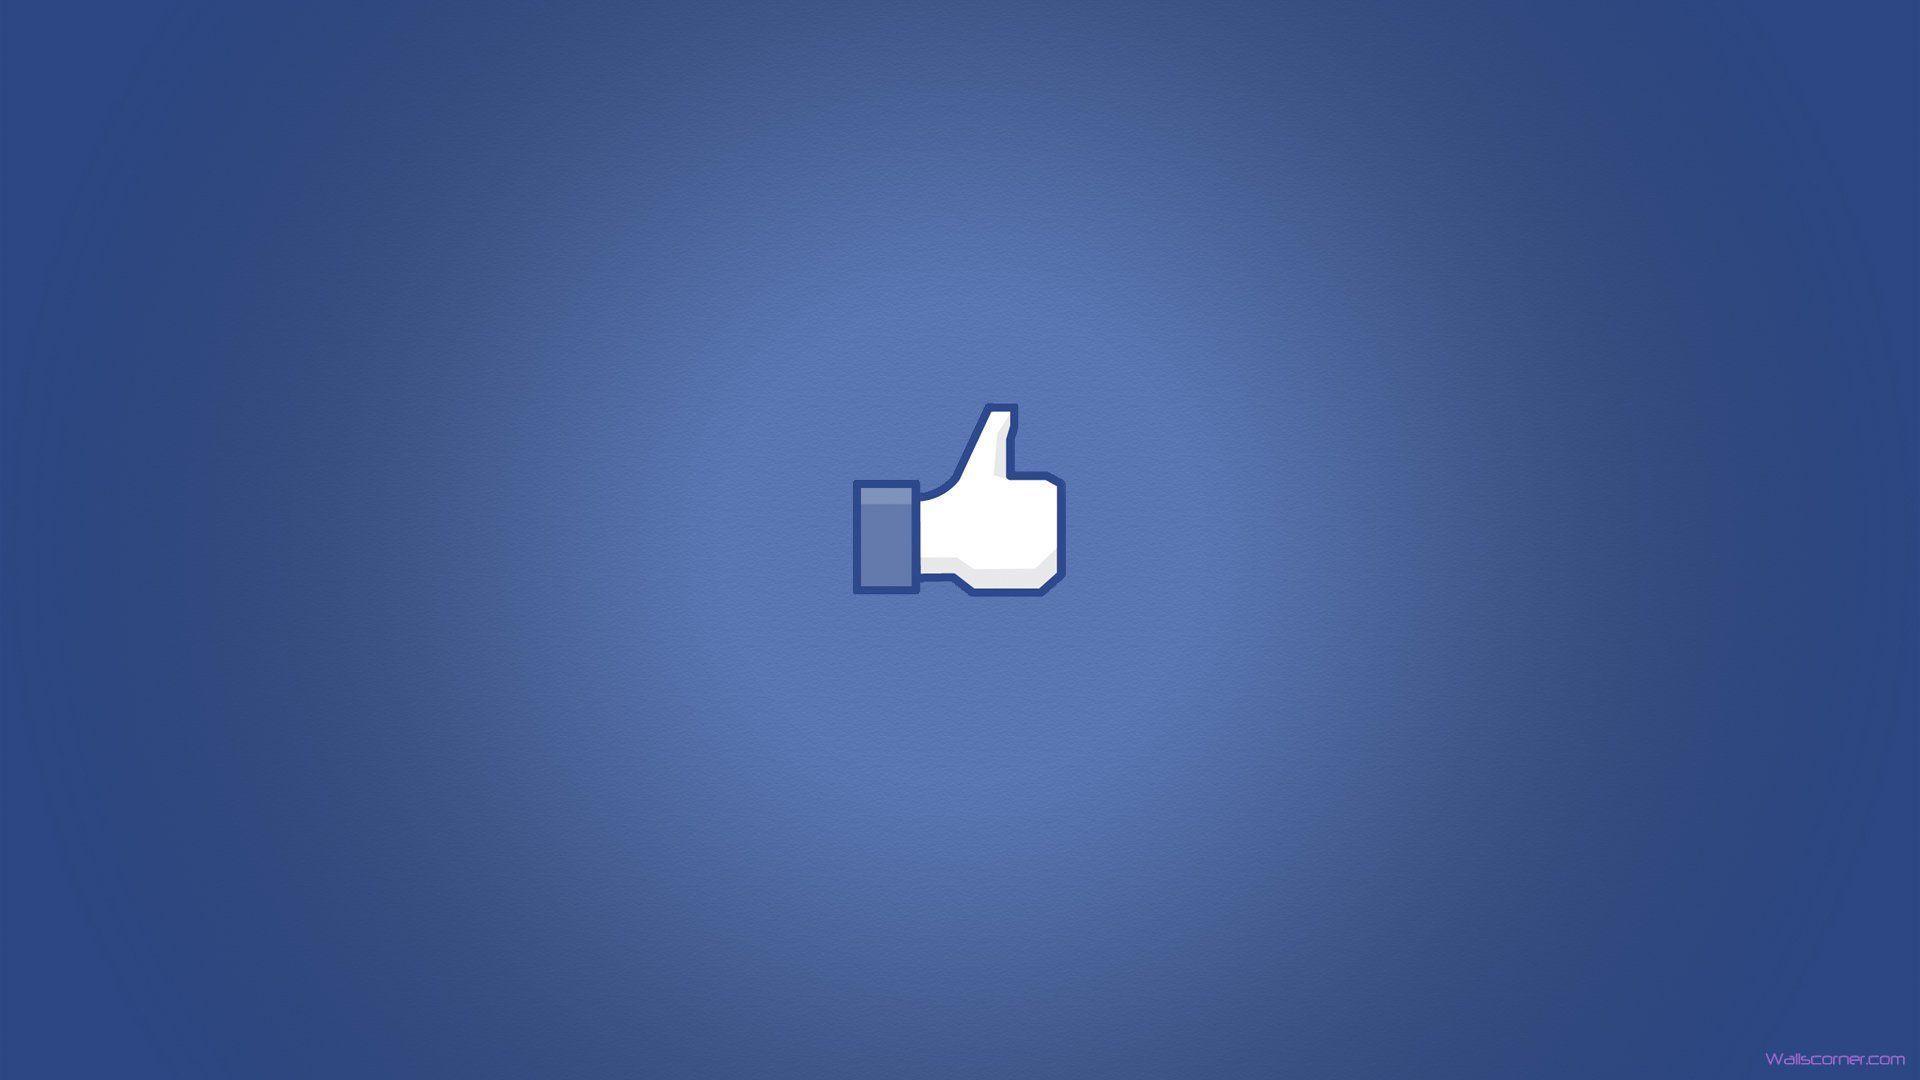 Facebook Logo Wallpapers - Wallpaper Cave